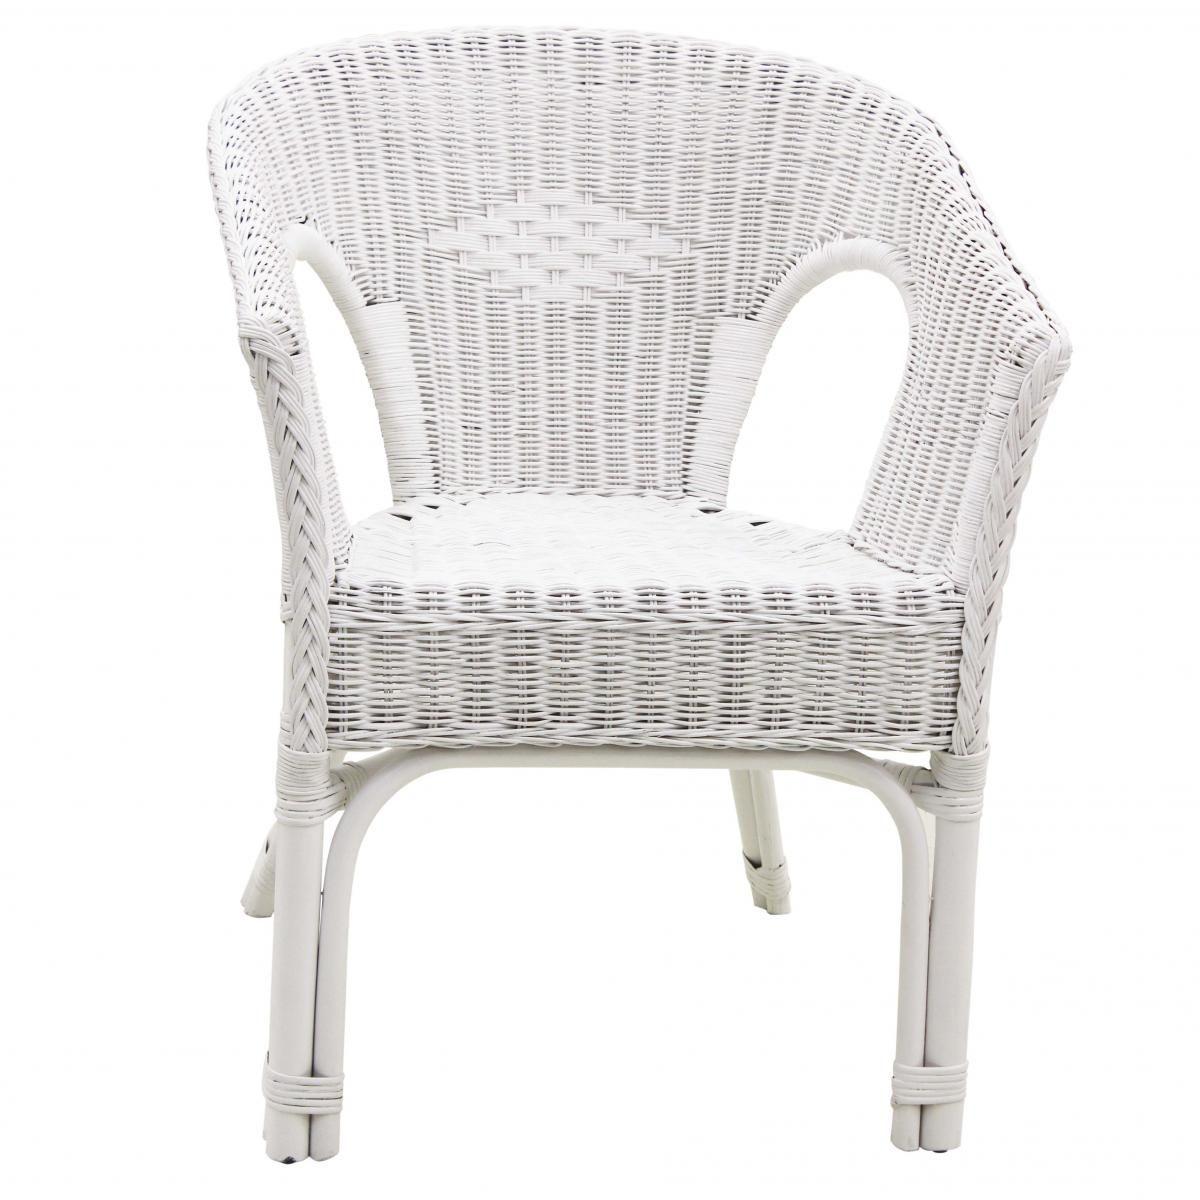 Kelek Cane Chair Urban & Beach Lifestyle Furniture NZ